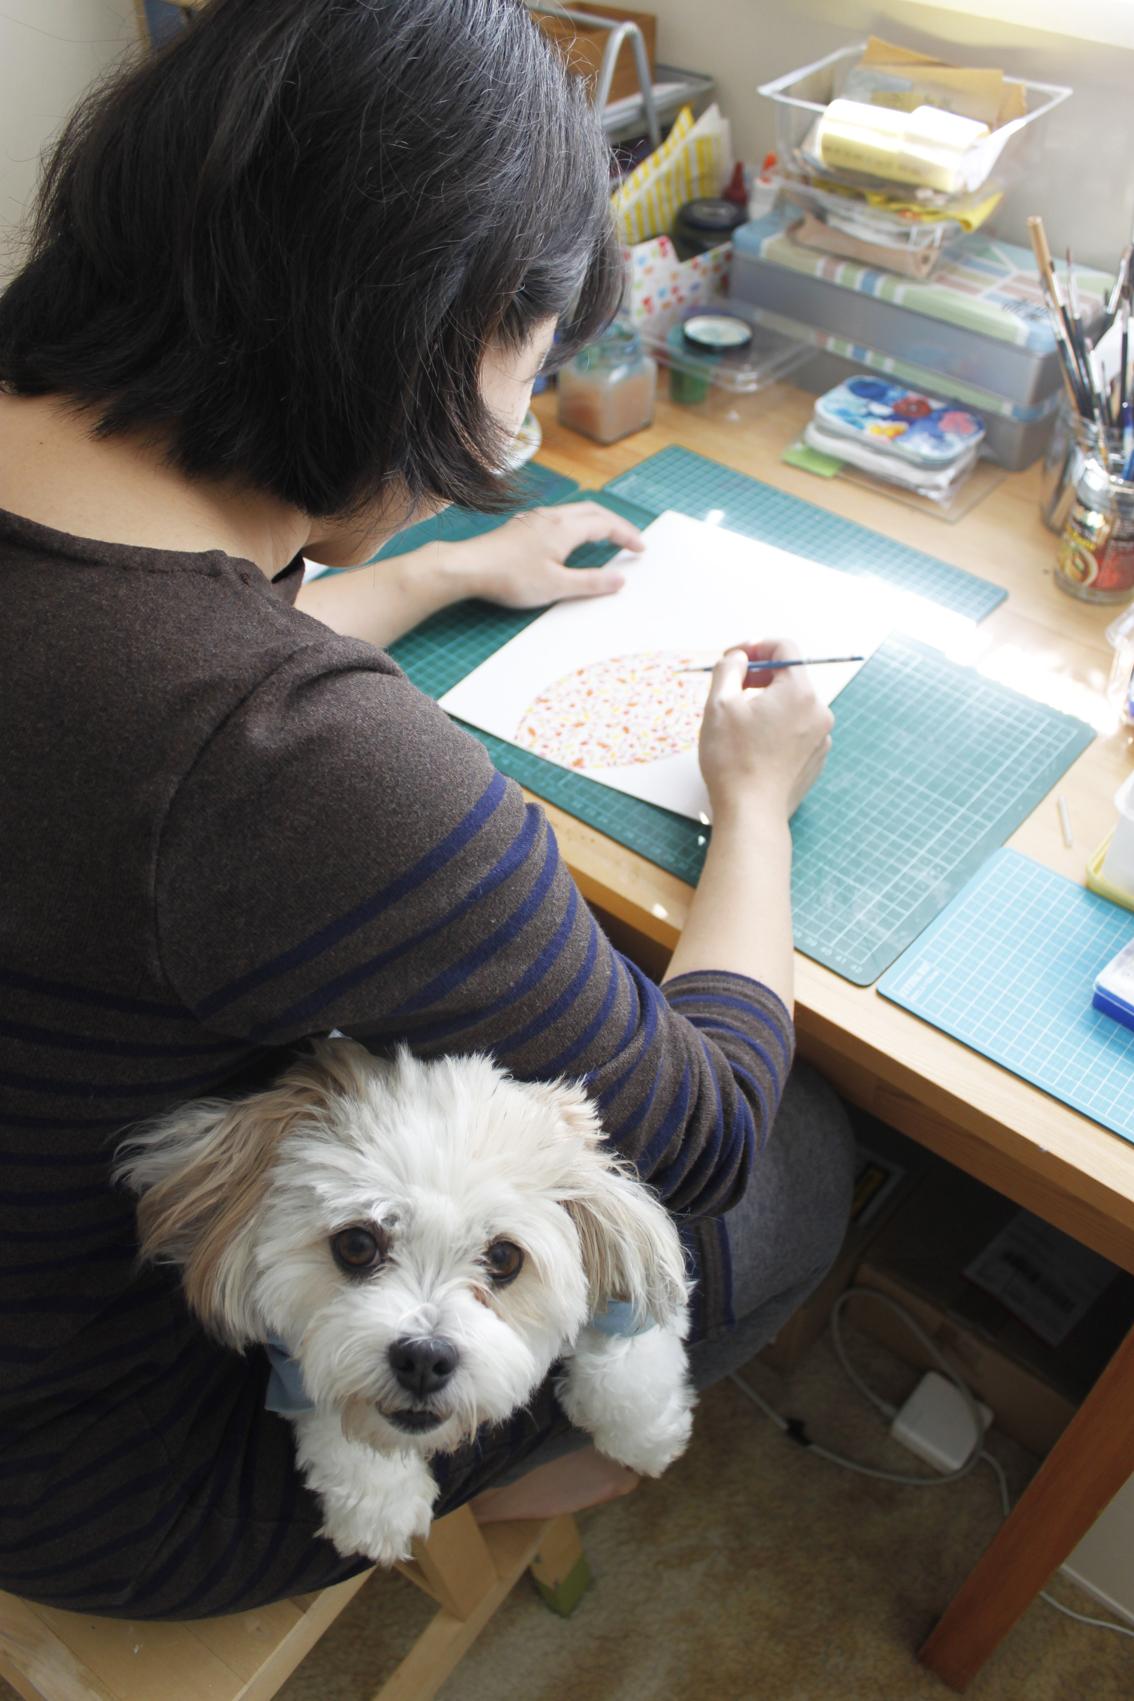 Jacqueline and her little helper Cuwie